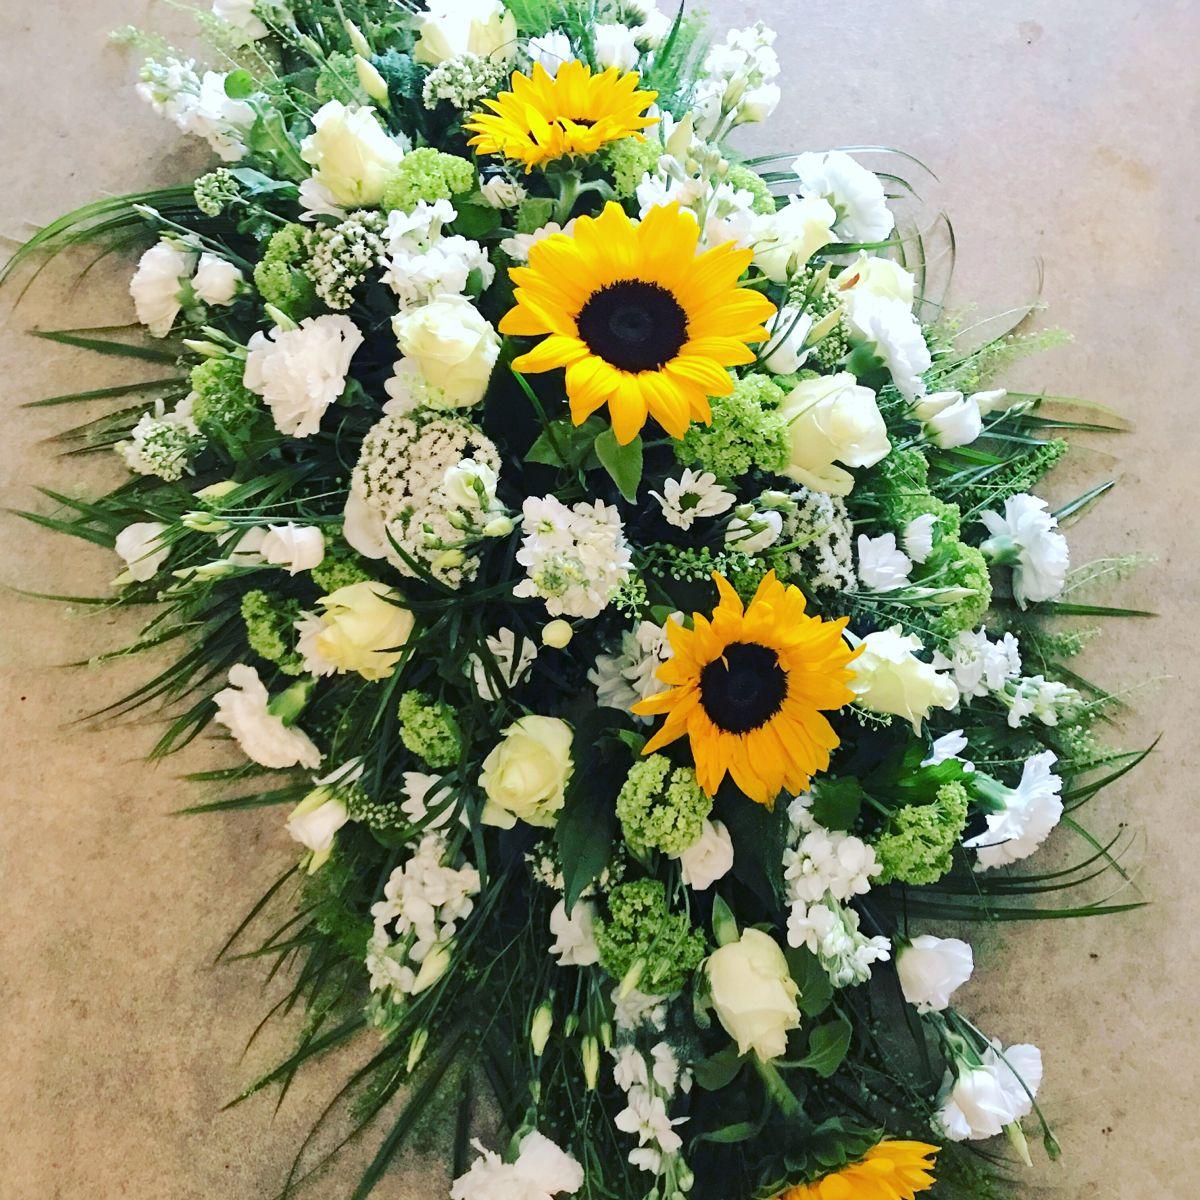 Casket spray in 2020 casket sprays funeral sprays casket